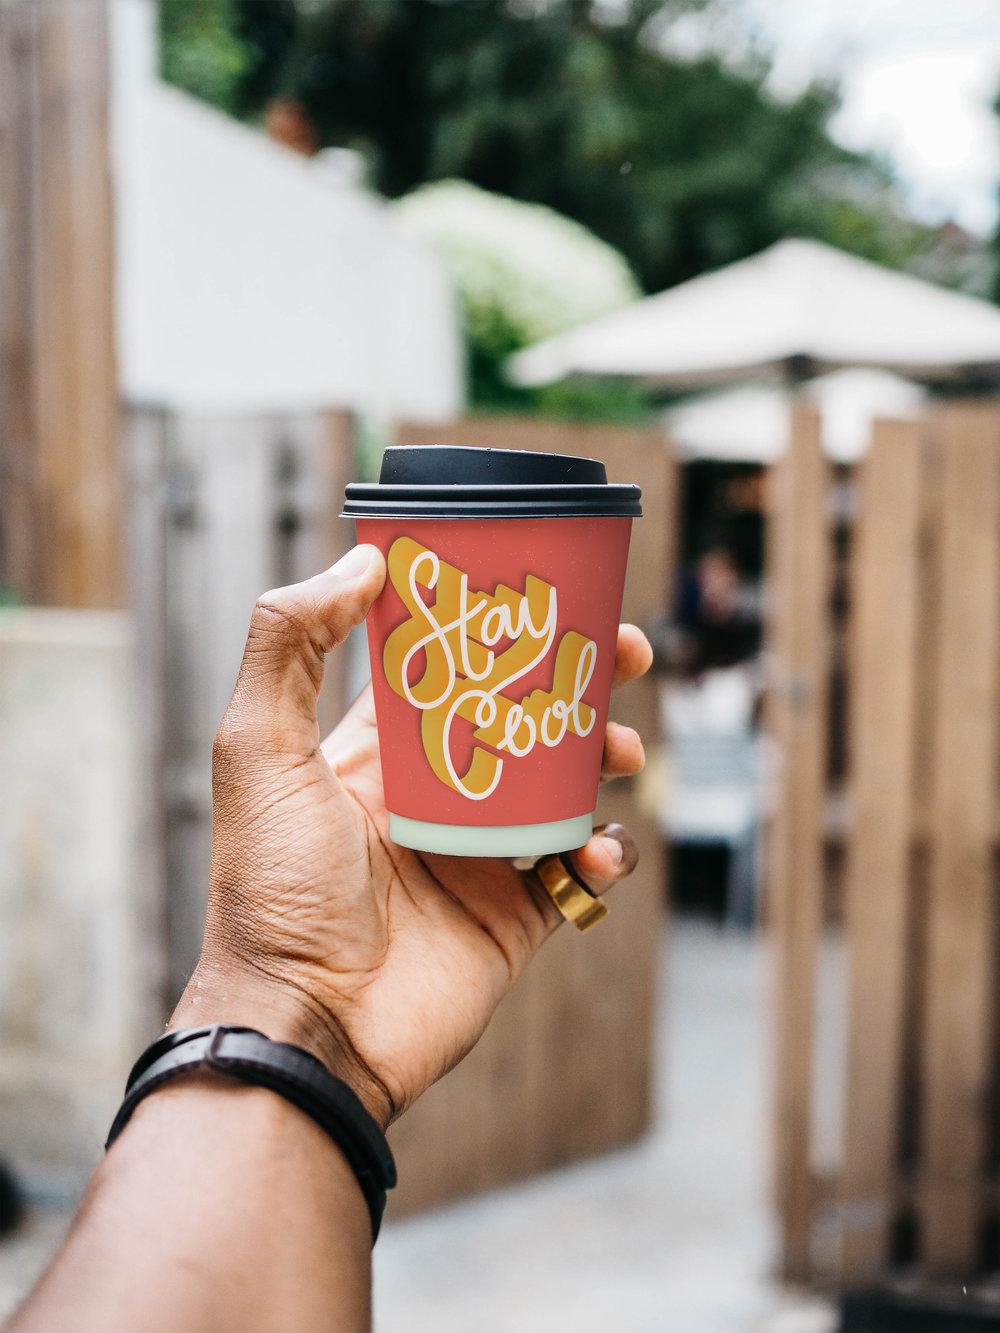 StayCool_CoffeeCup.jpg